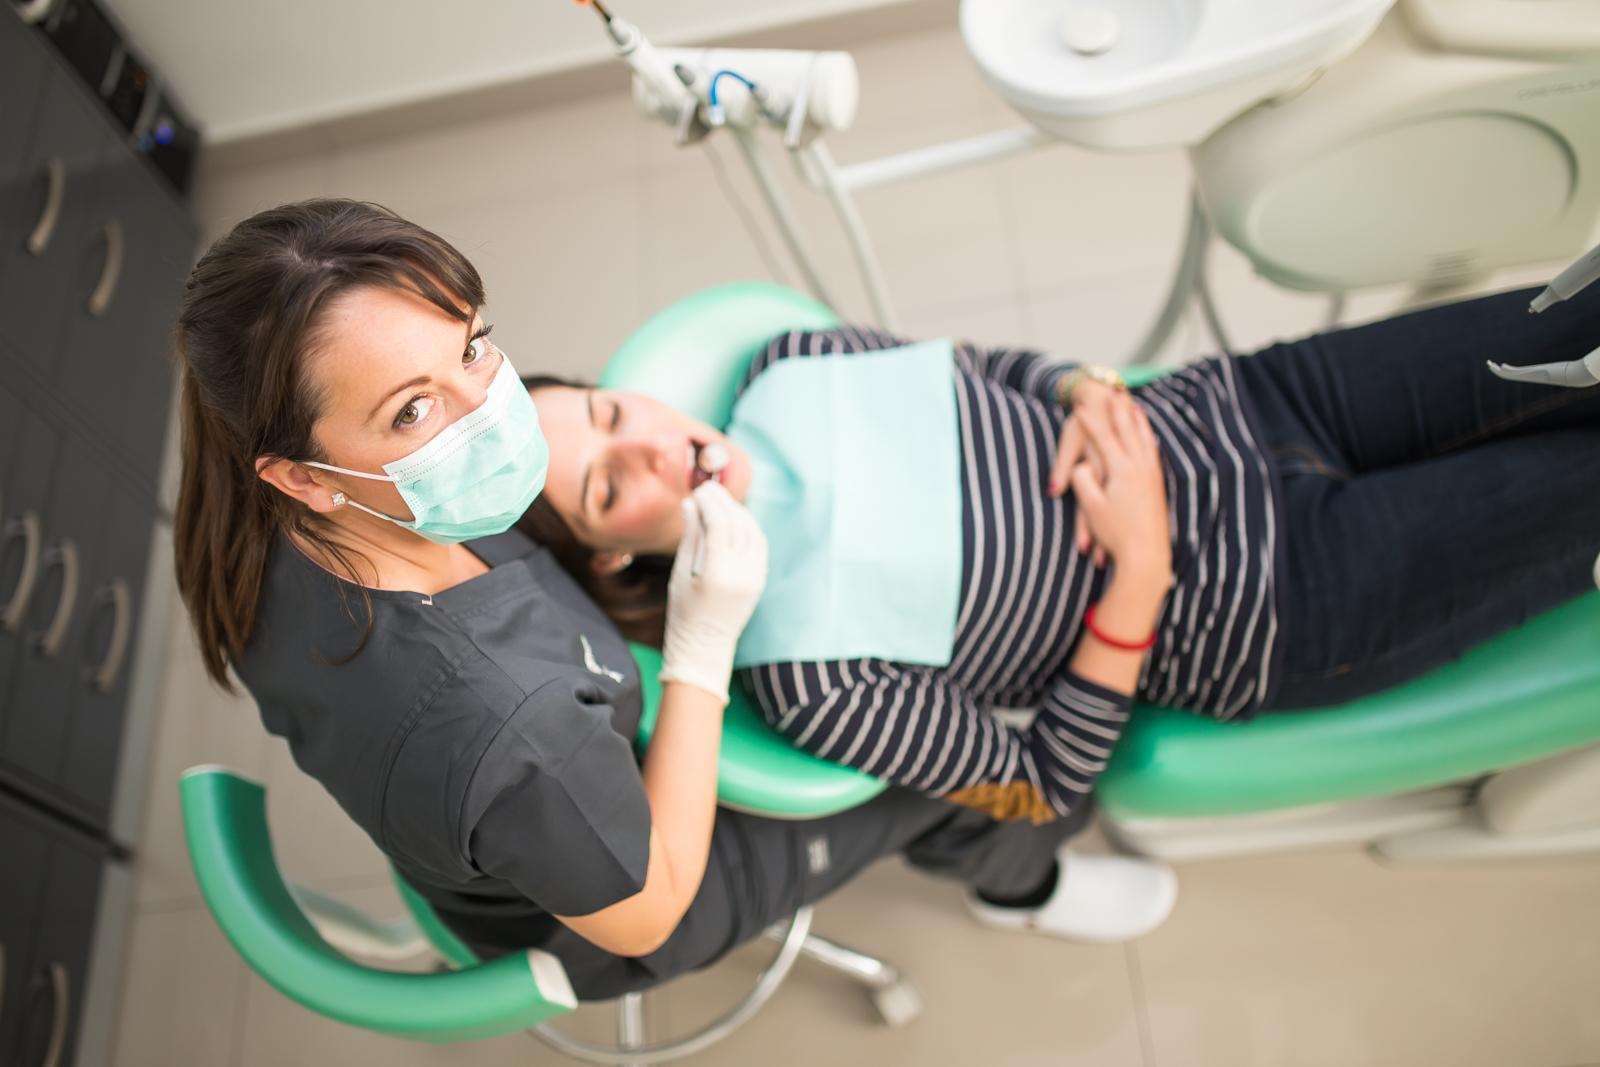 Dra. Ana Orozco Varo en gabinete de clinica dental en sevilla